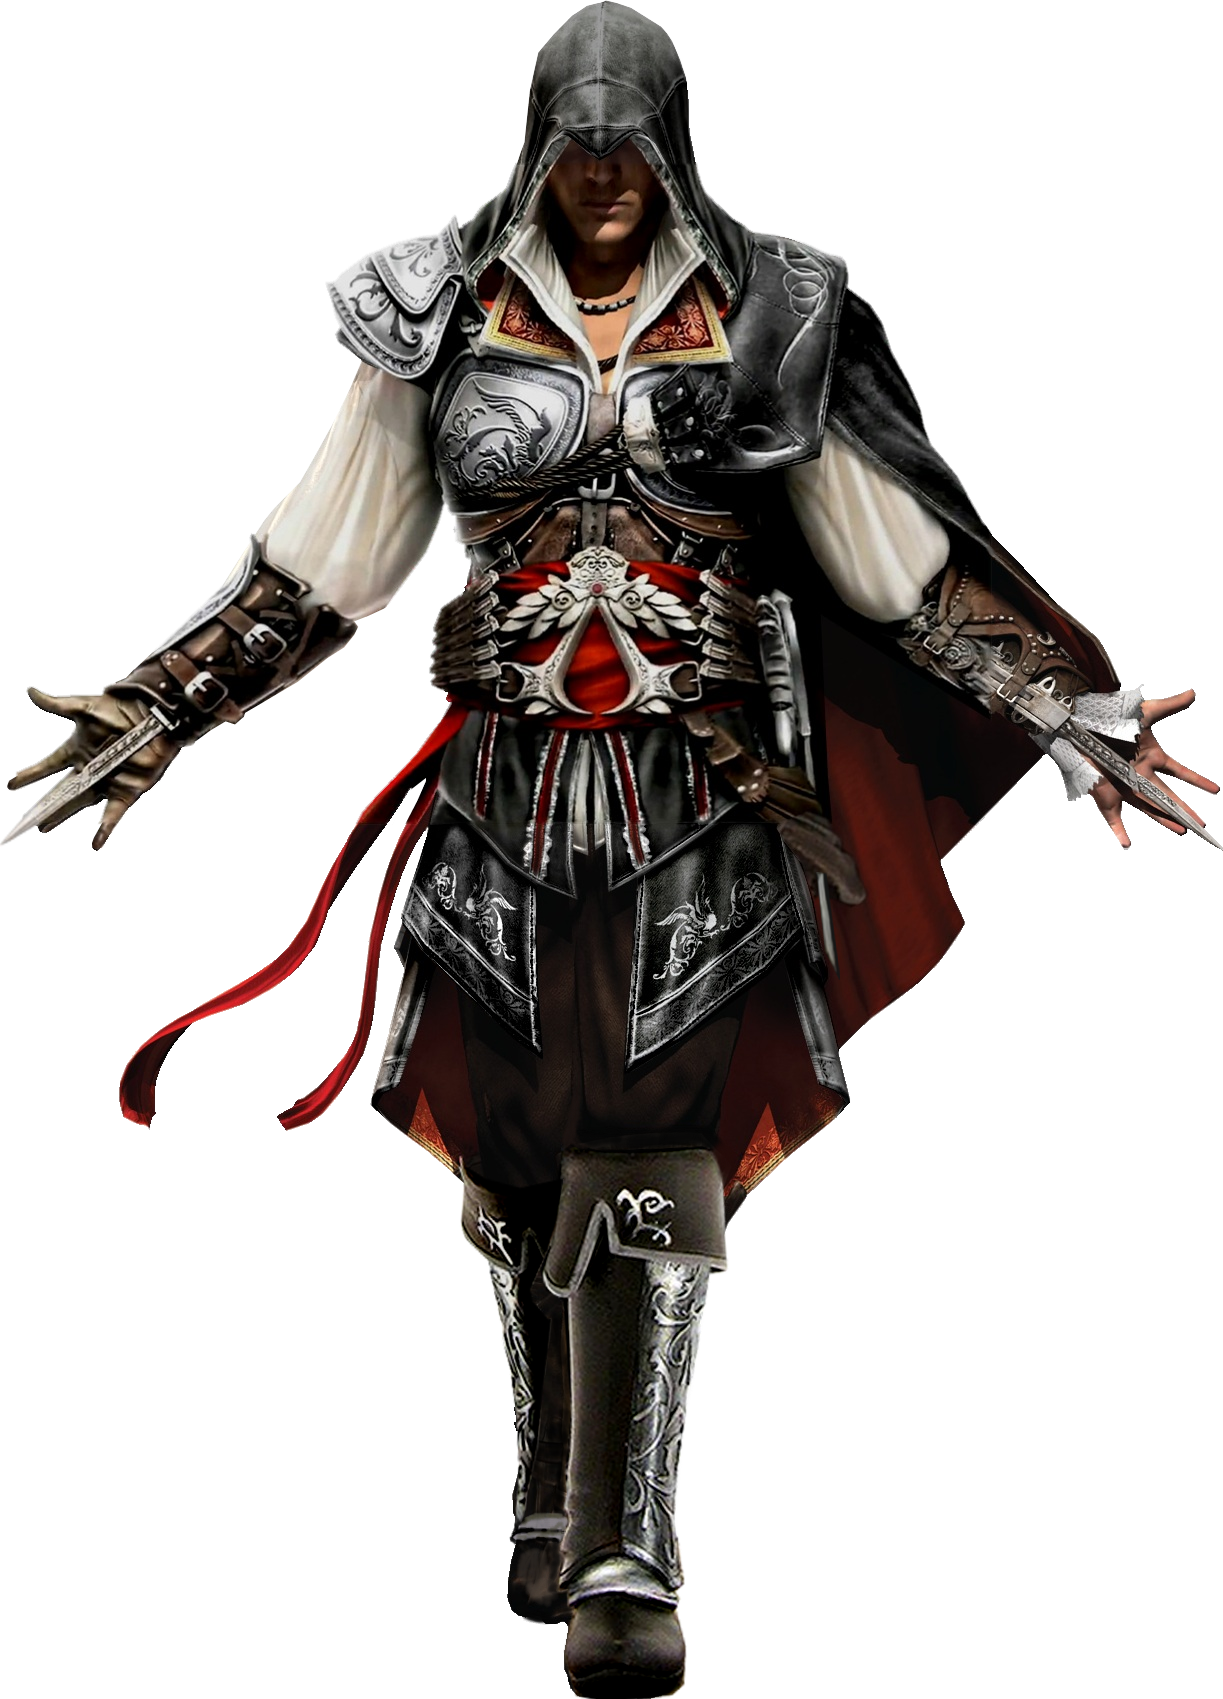 9073B22Ca9895Cb05F810Cfff1B43C1E.png - Assassins Creed, Transparent background PNG HD thumbnail